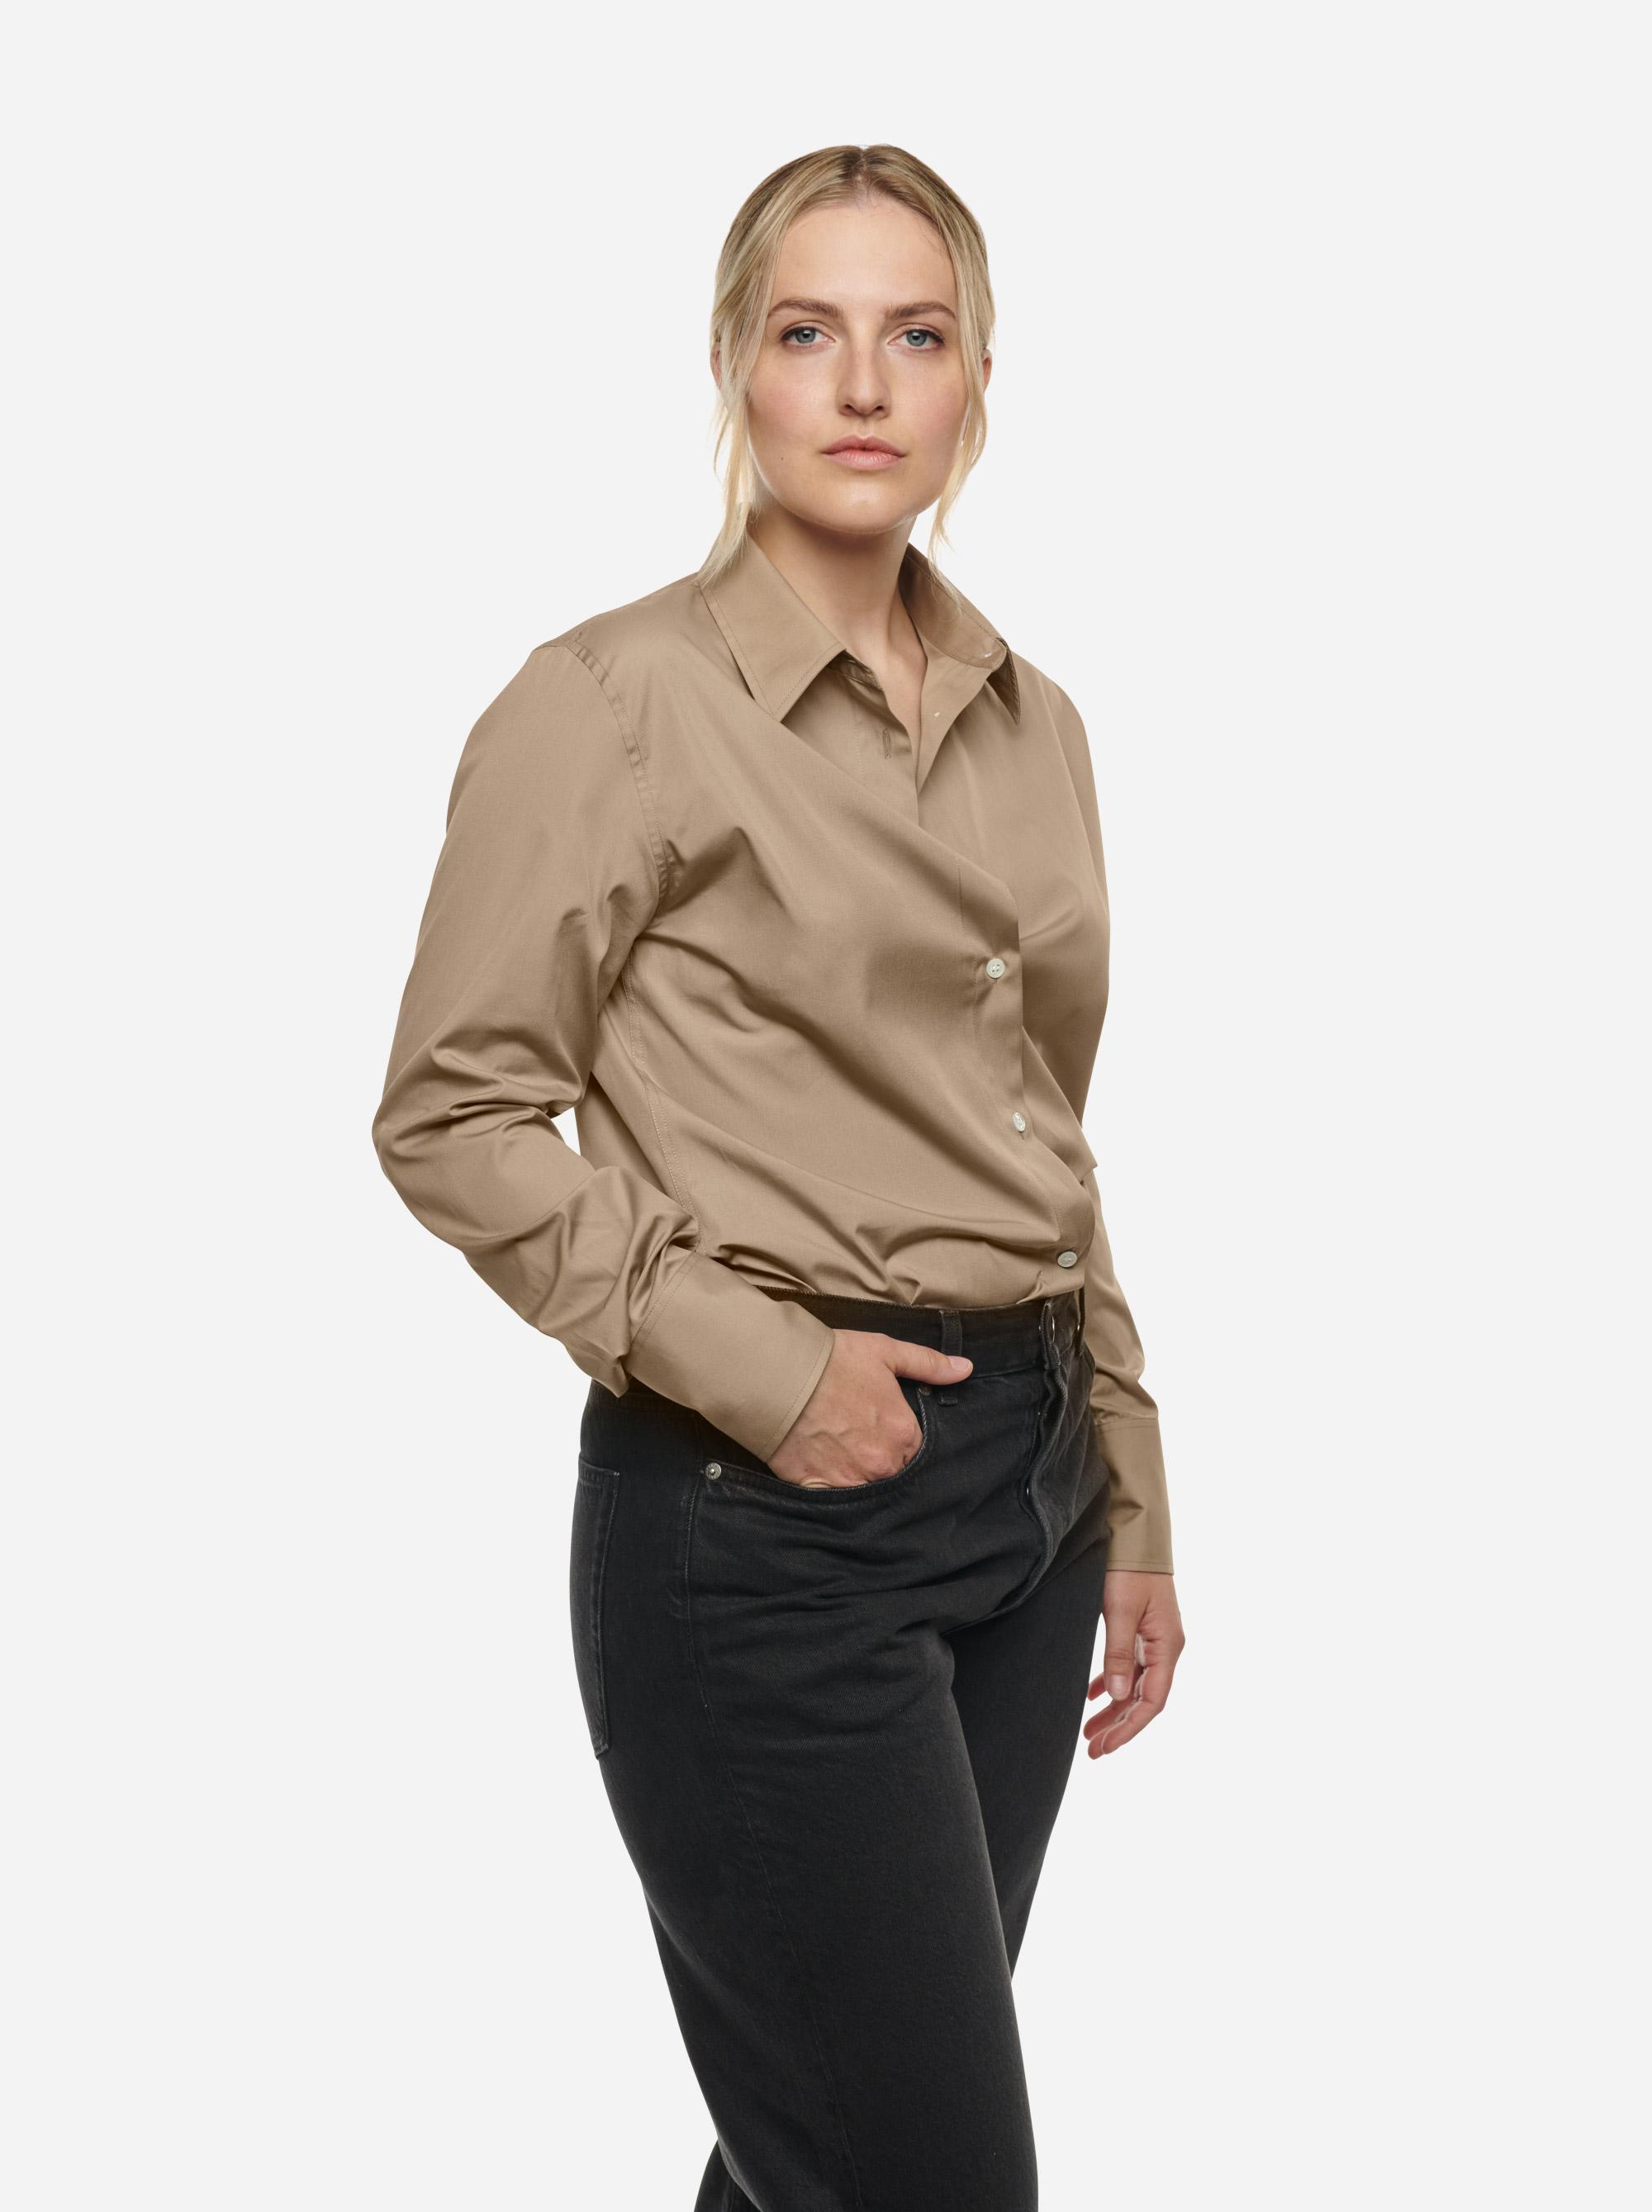 Teym-Shirt-Beige_women-2